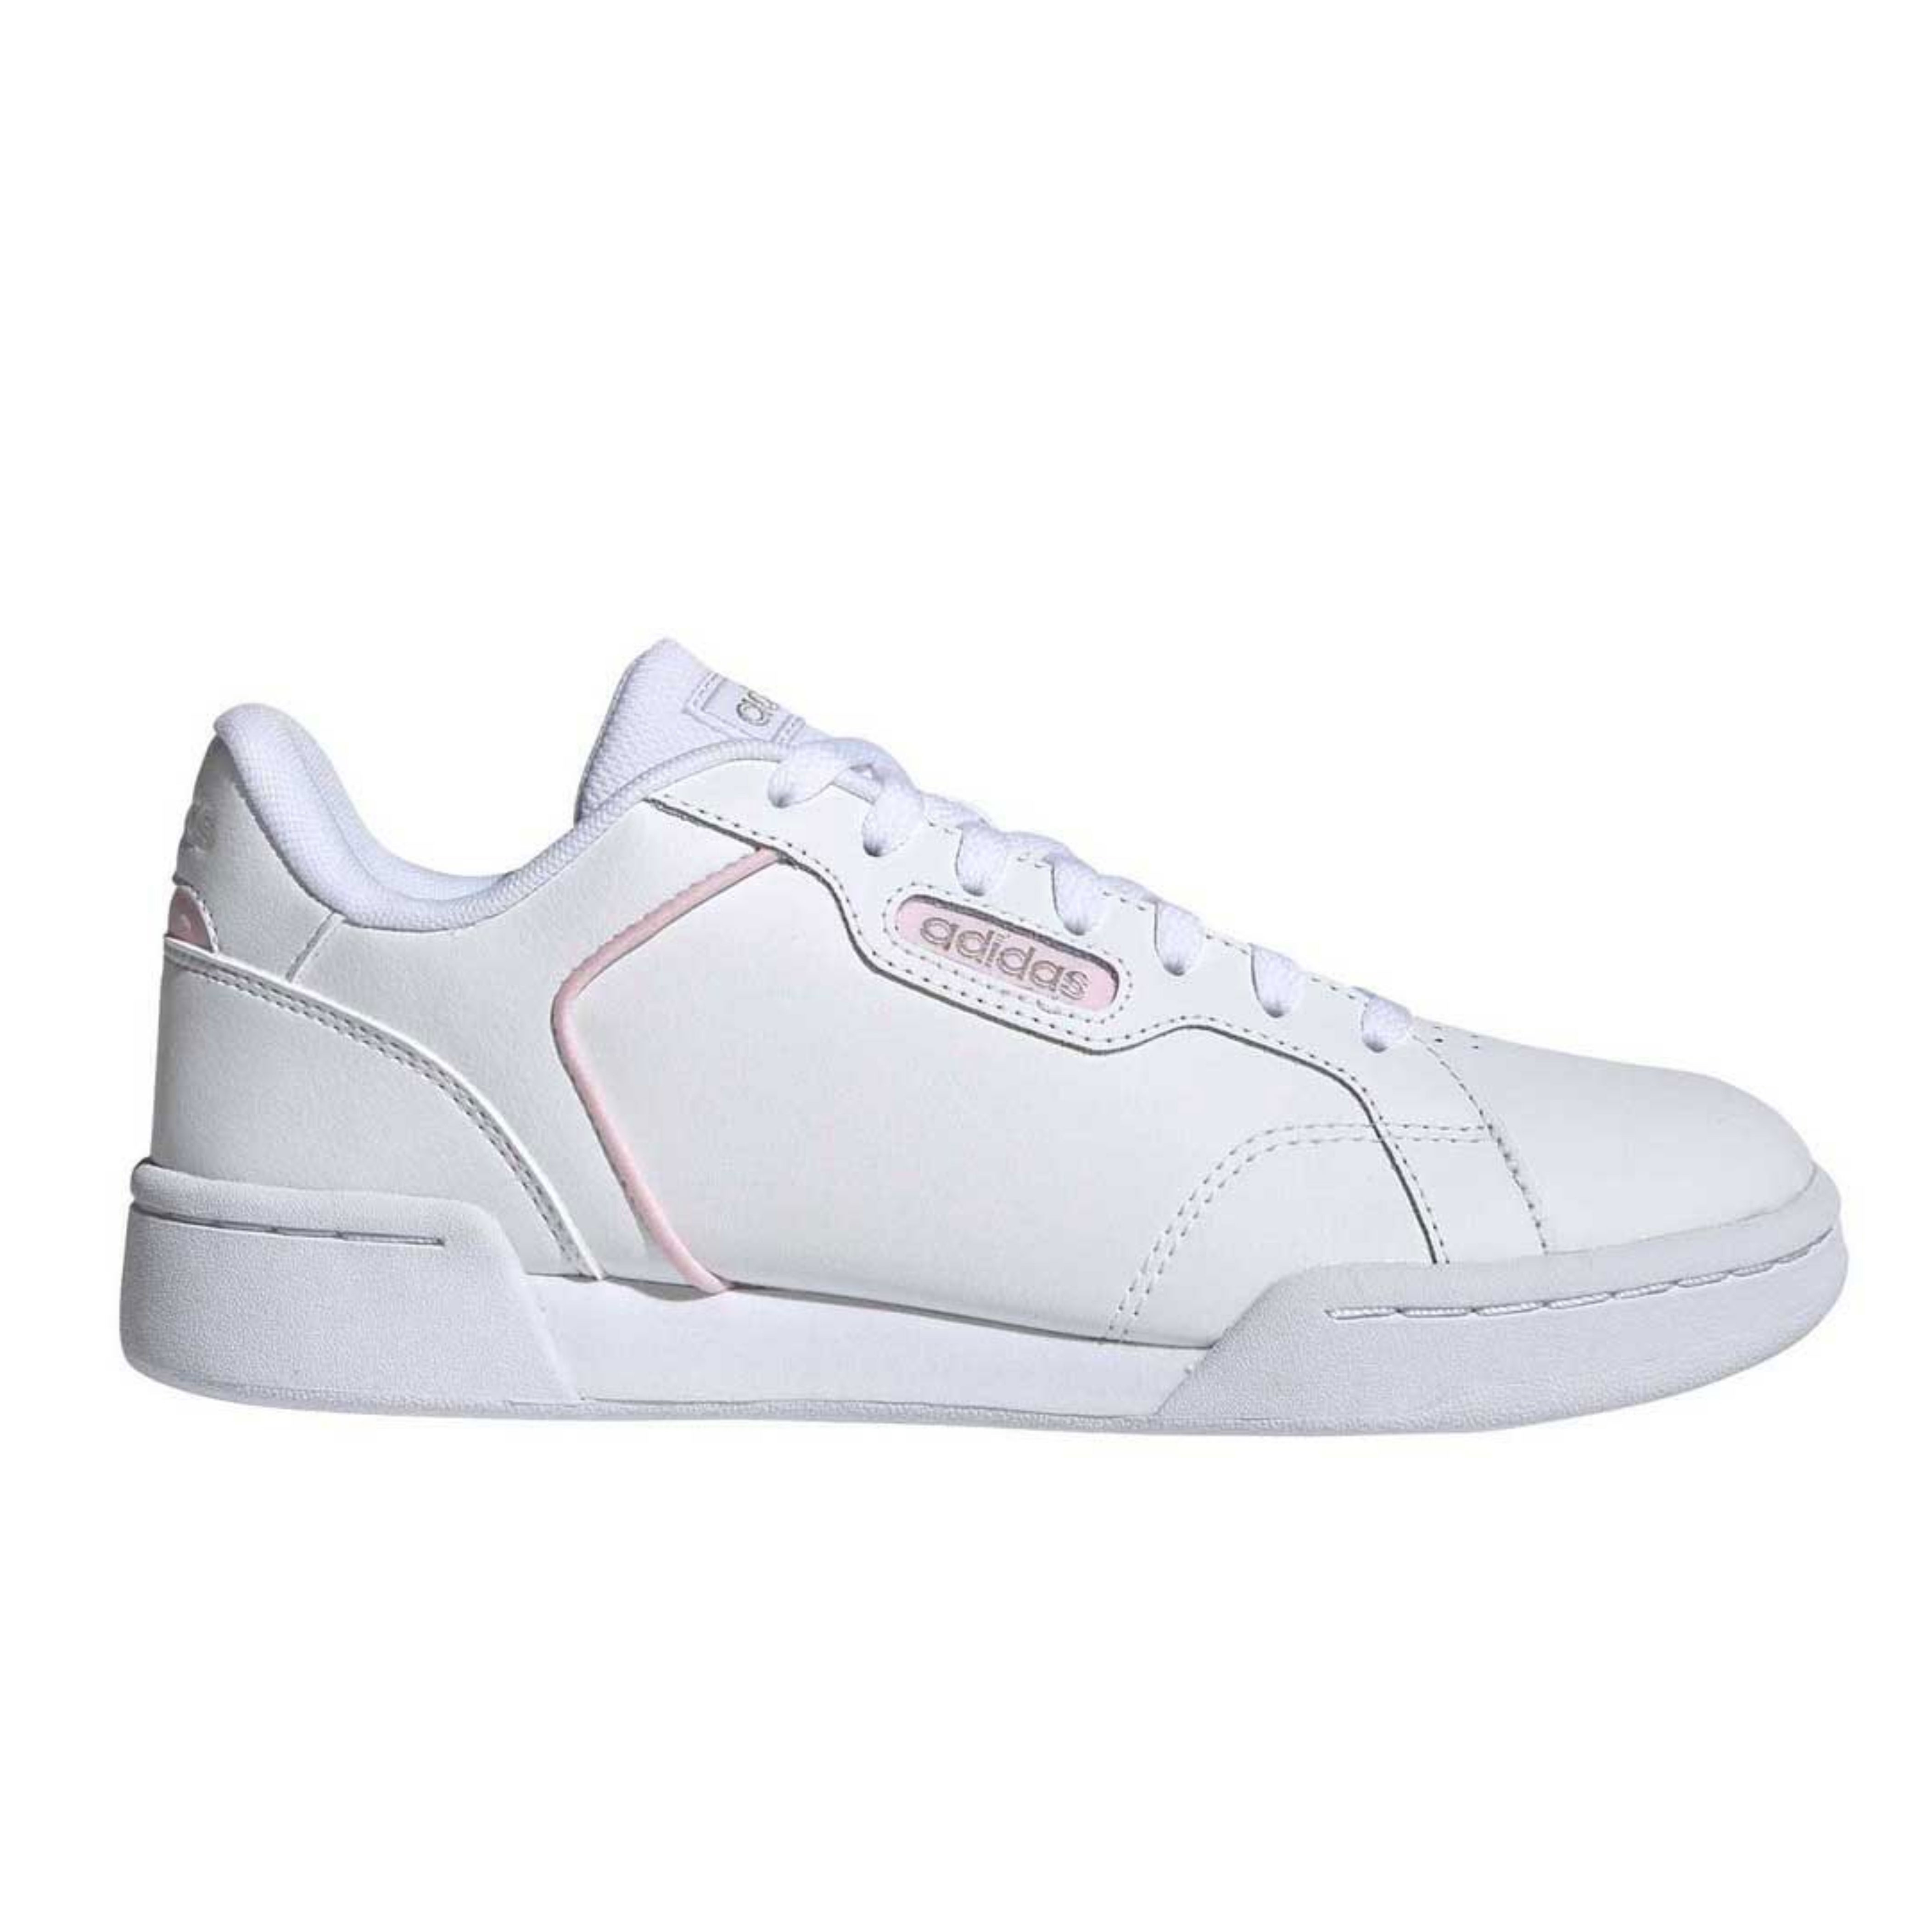 Roguera Sneakers Adidas EG2662  -9